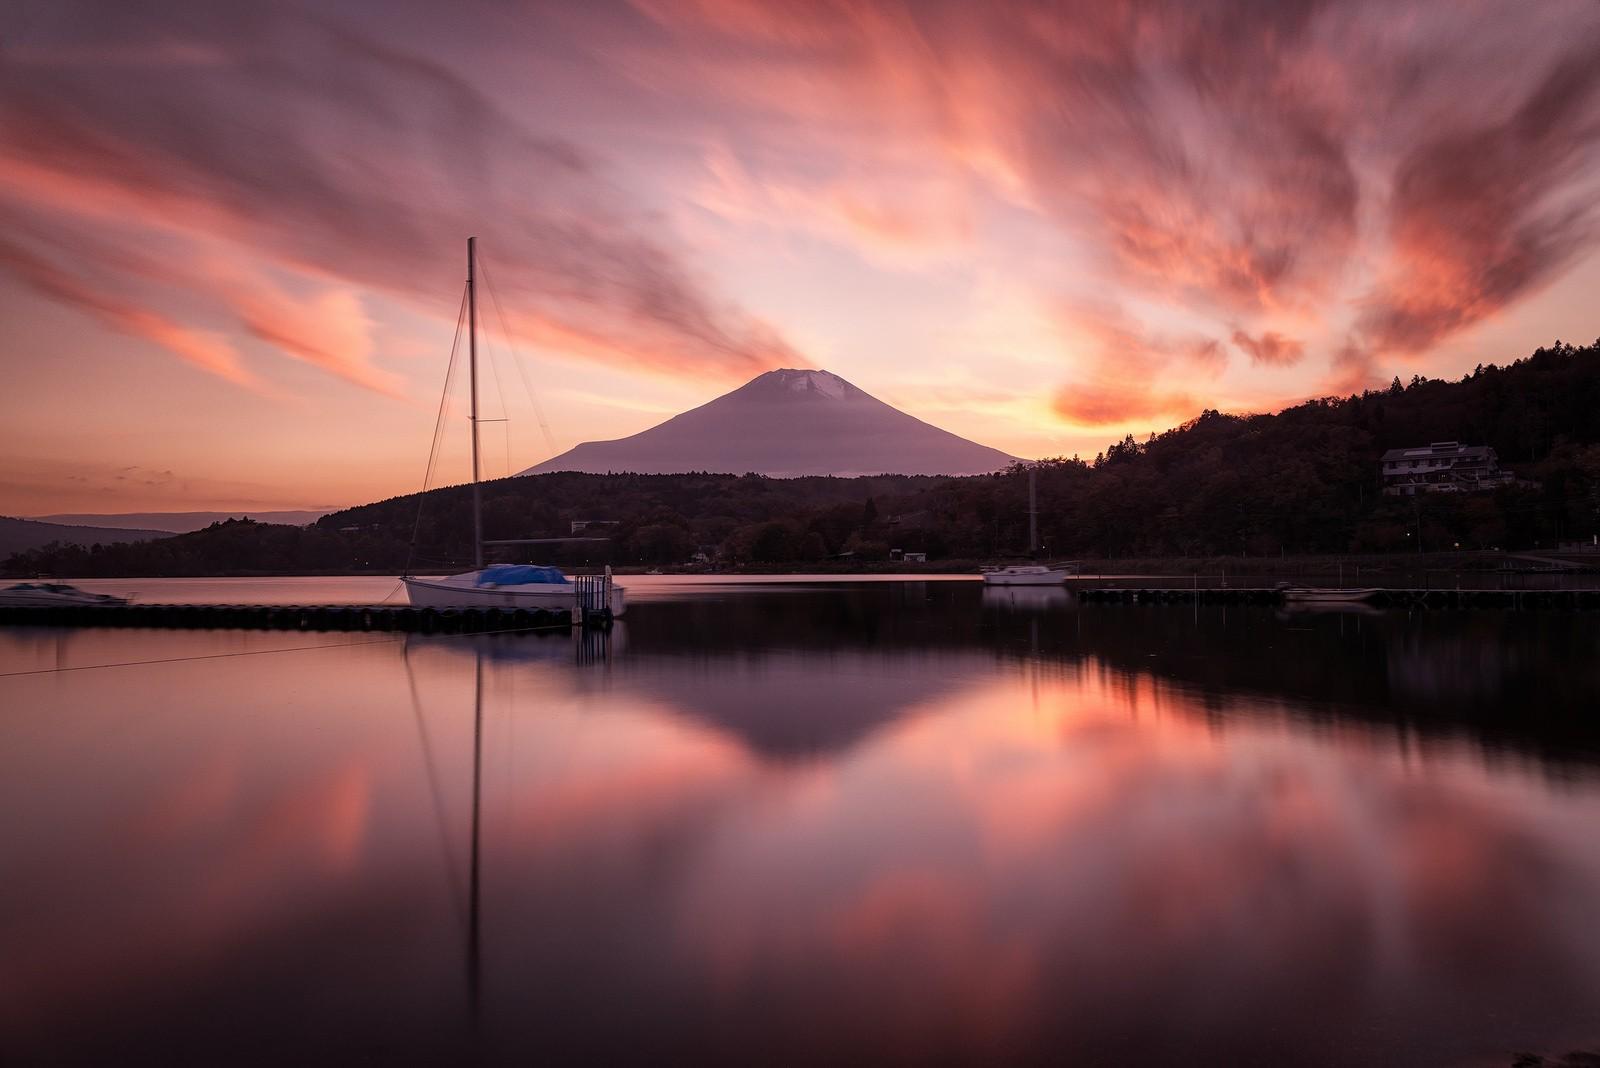 Burning Sunset - Foto de Yuga Kurita